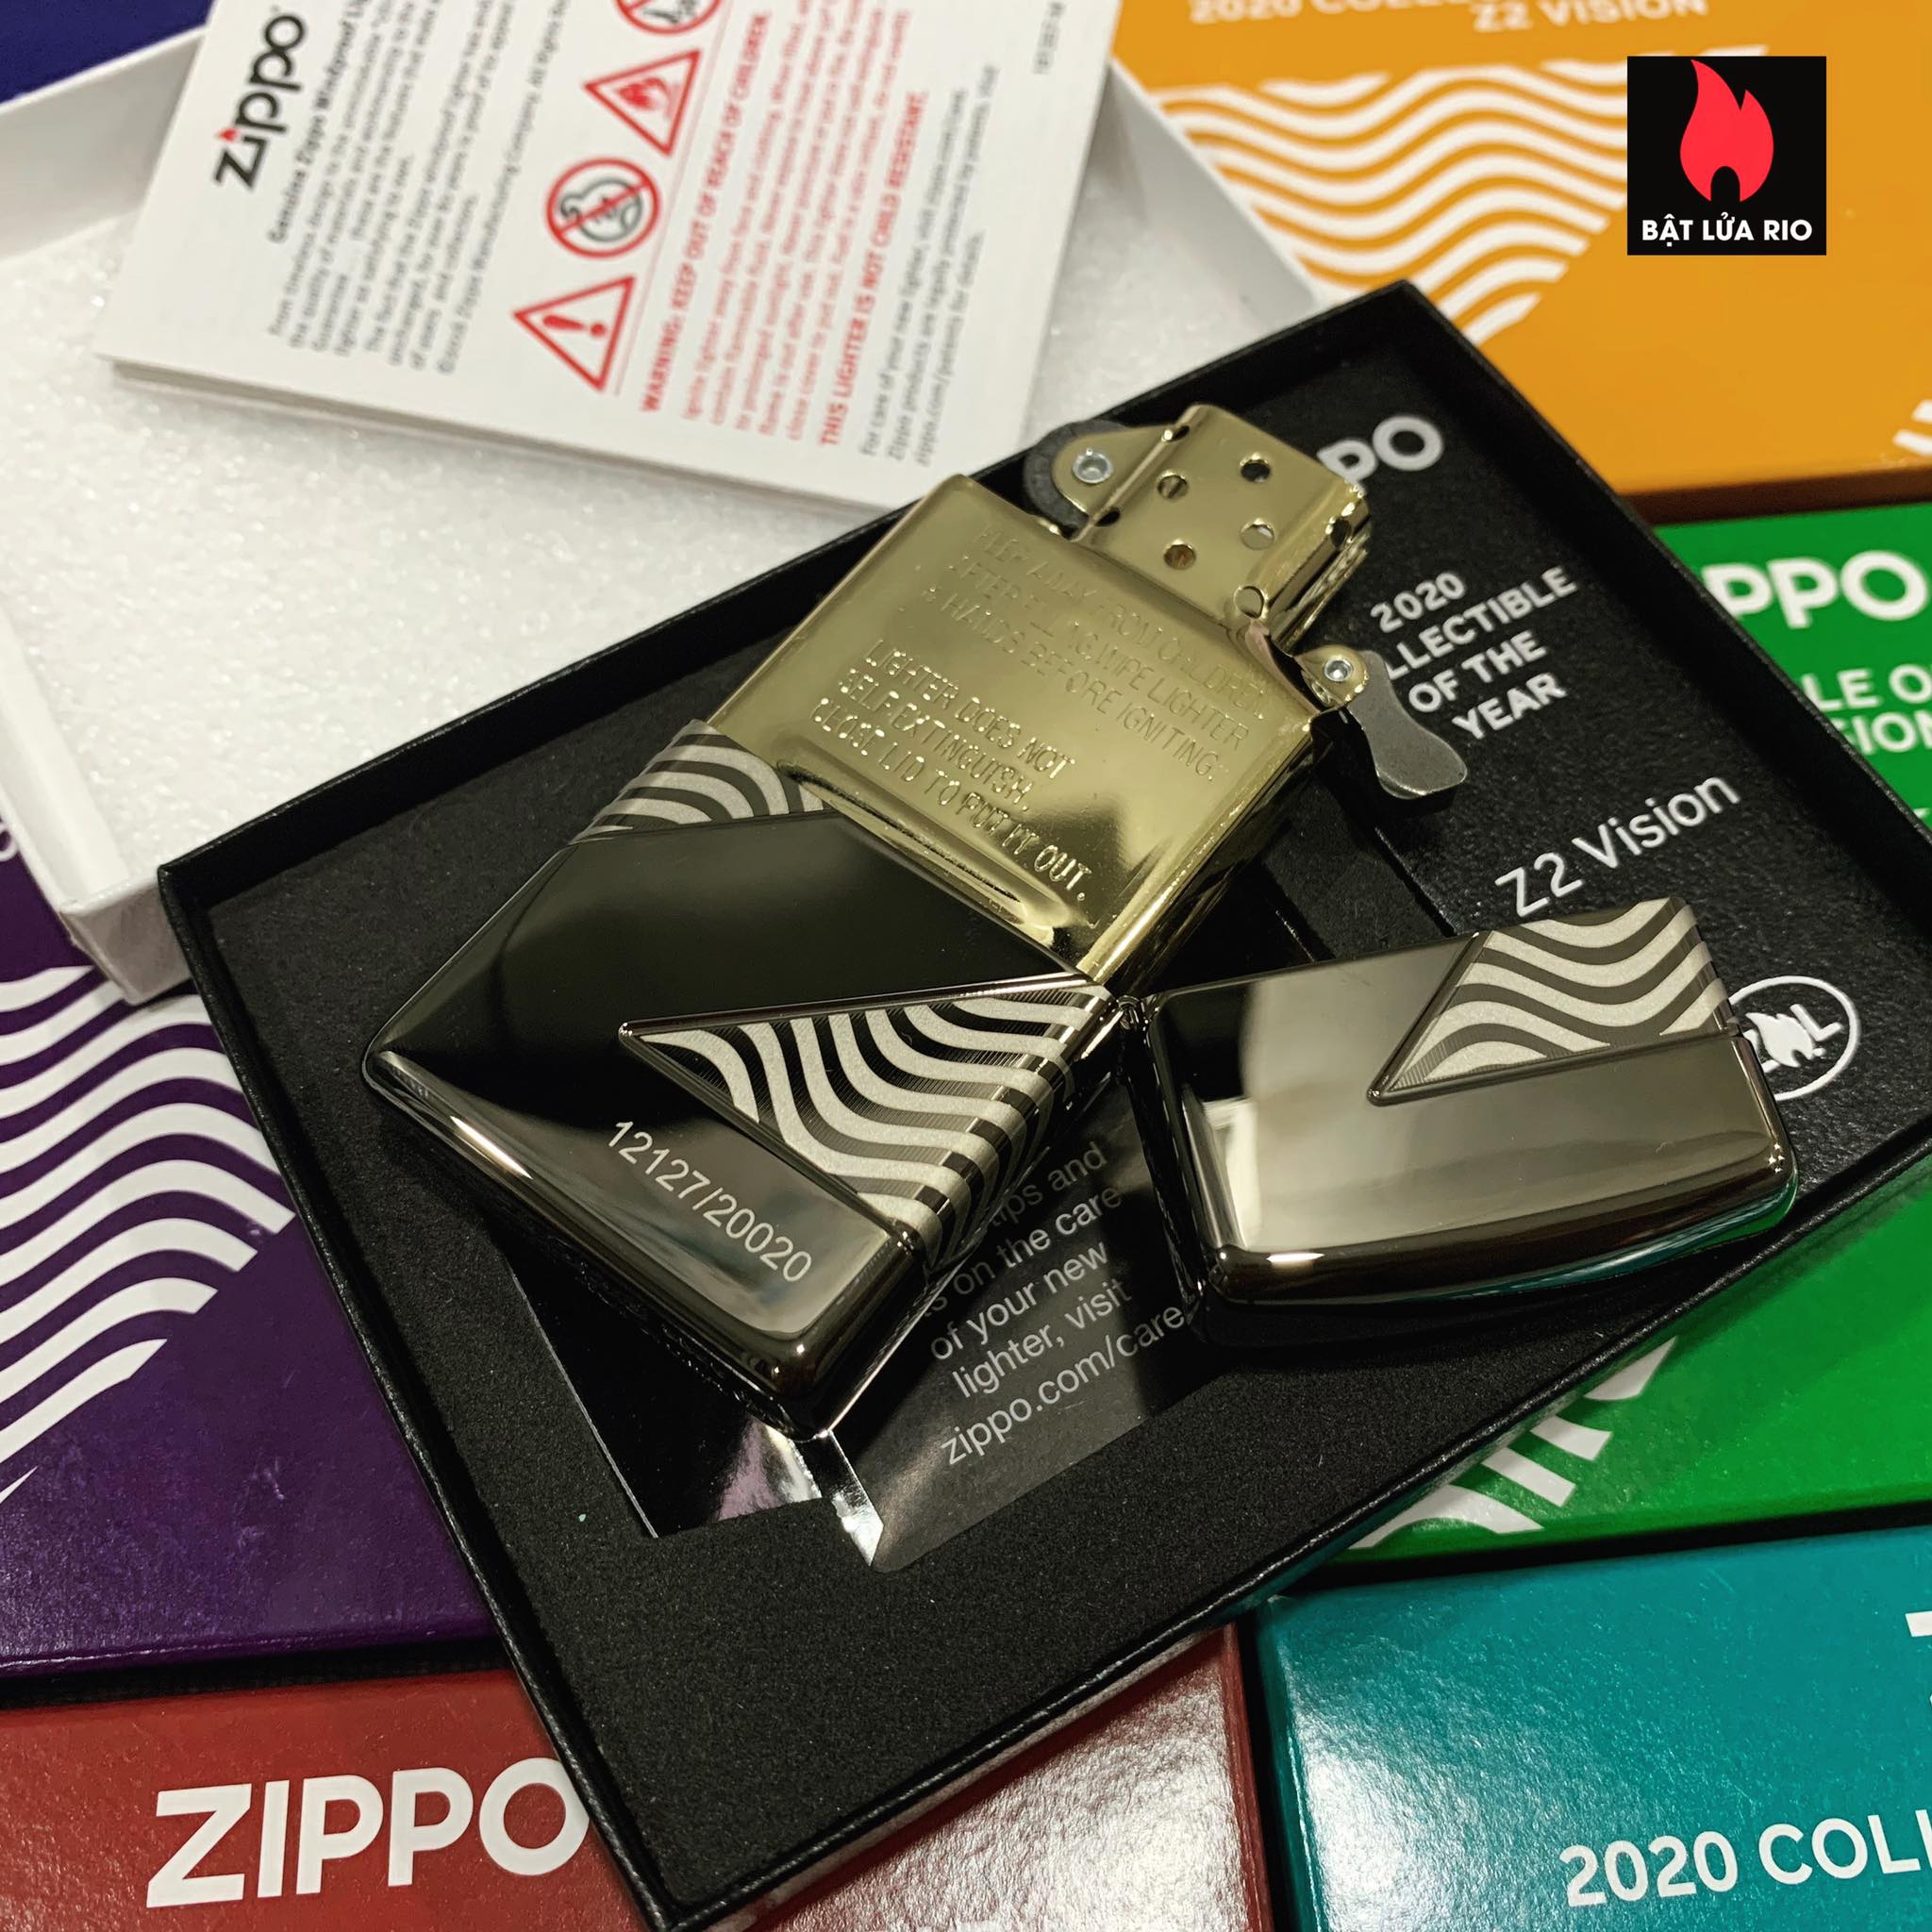 Zippo 49194 - Zippo 2020 Collectible Of The Year - Zippo Coty 2020 - Zippo Z2 Vision 28